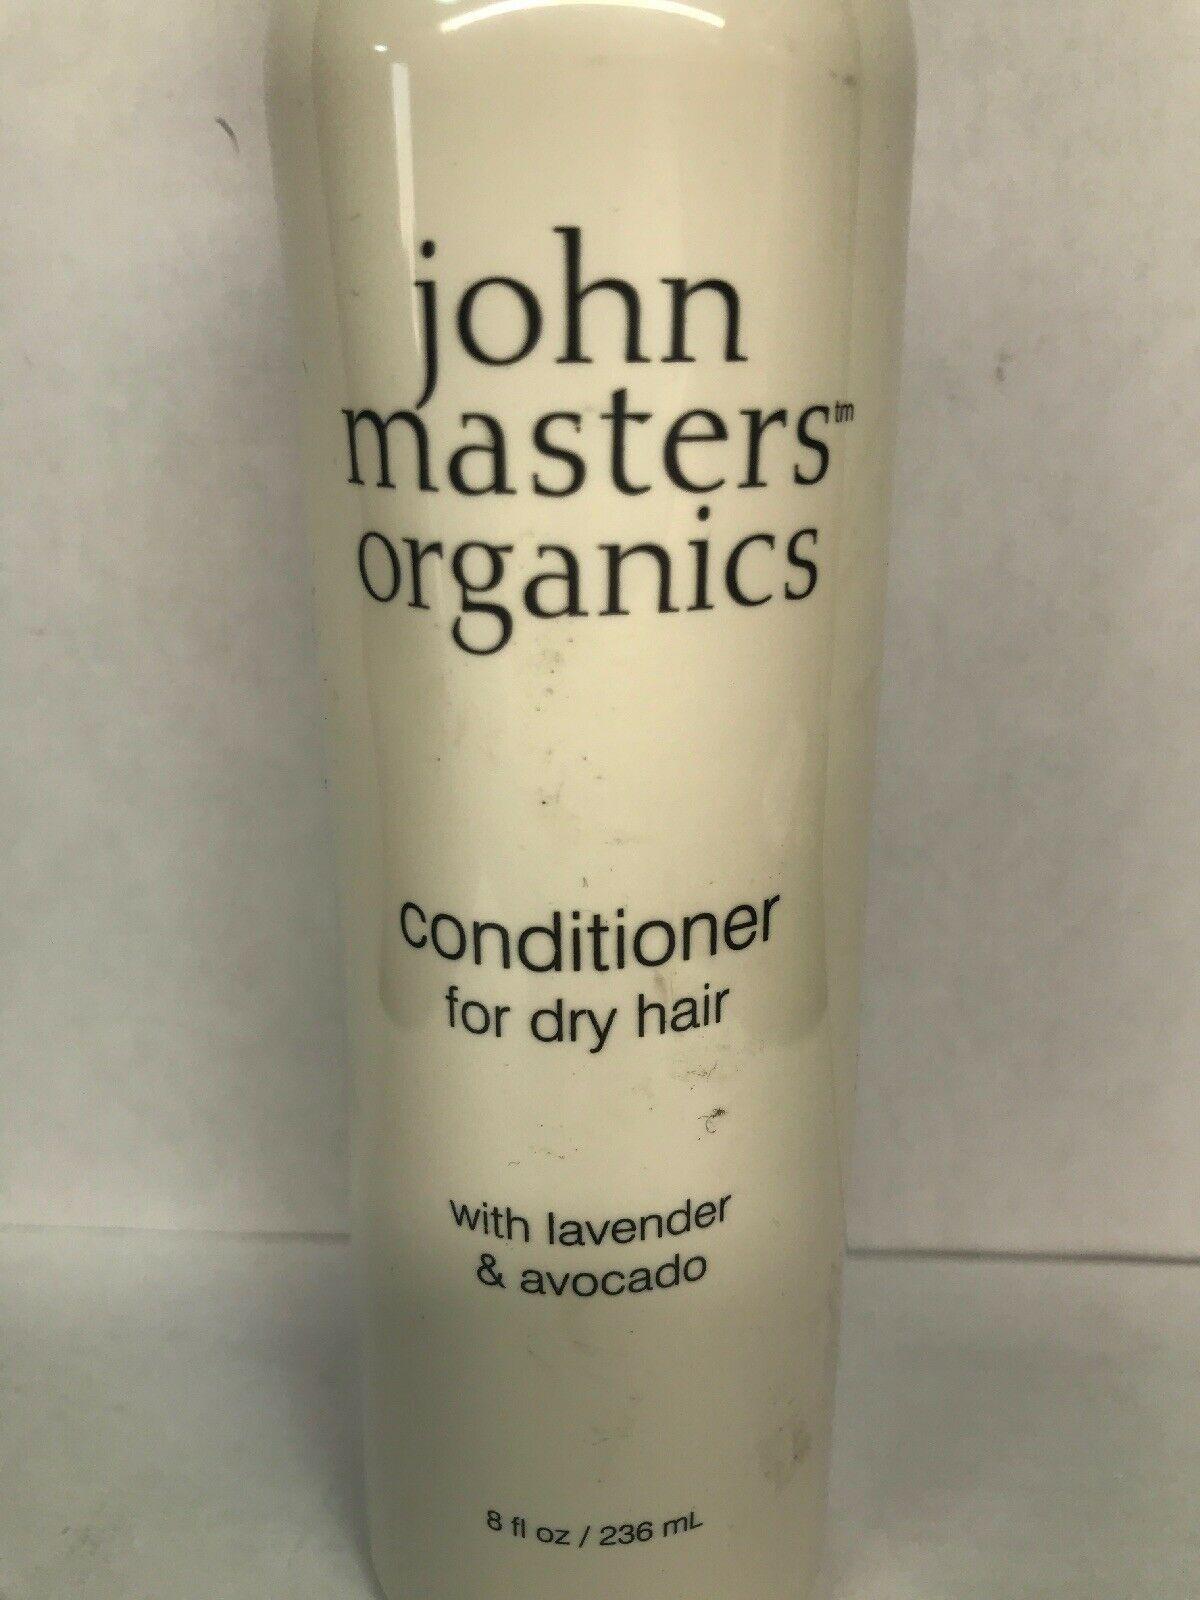 John Masters Organics Conditioner For Dry Hair 8 Ounce w/ Lavendar & Avocado image 2